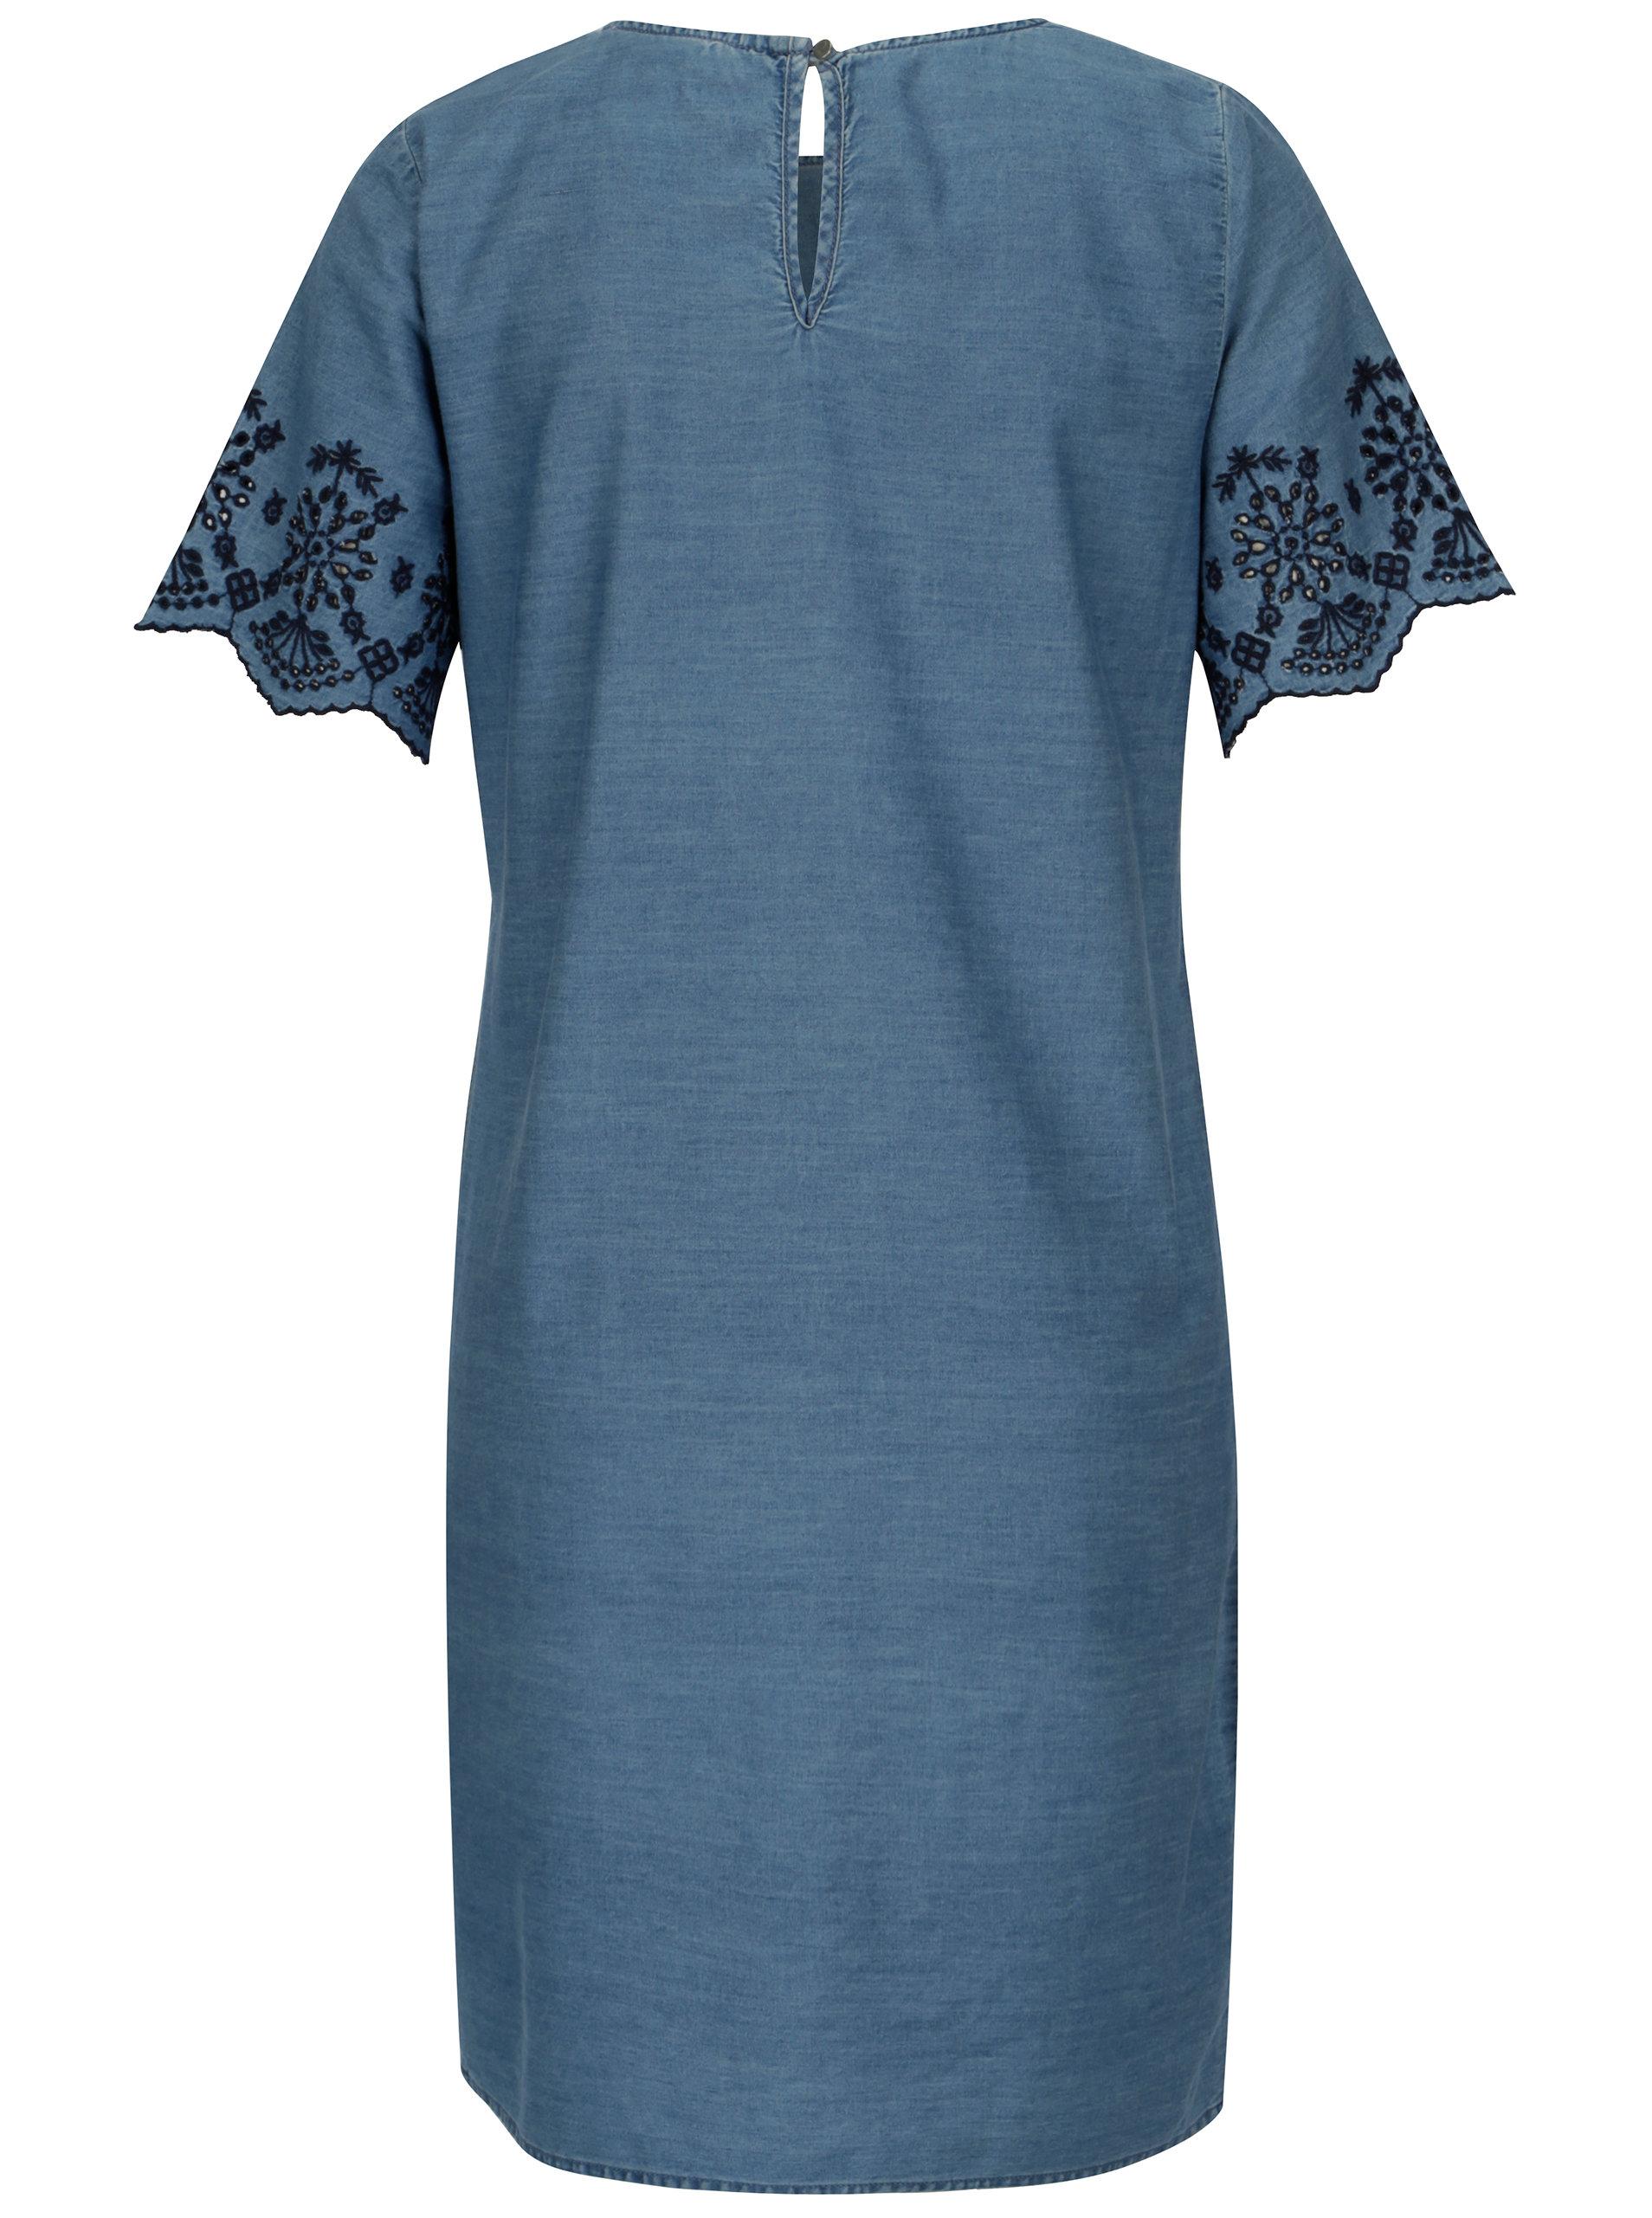 32b8b0b1596b Modré džínové šaty s krátkým rukávem a krajkou Dorothy Perkins ...